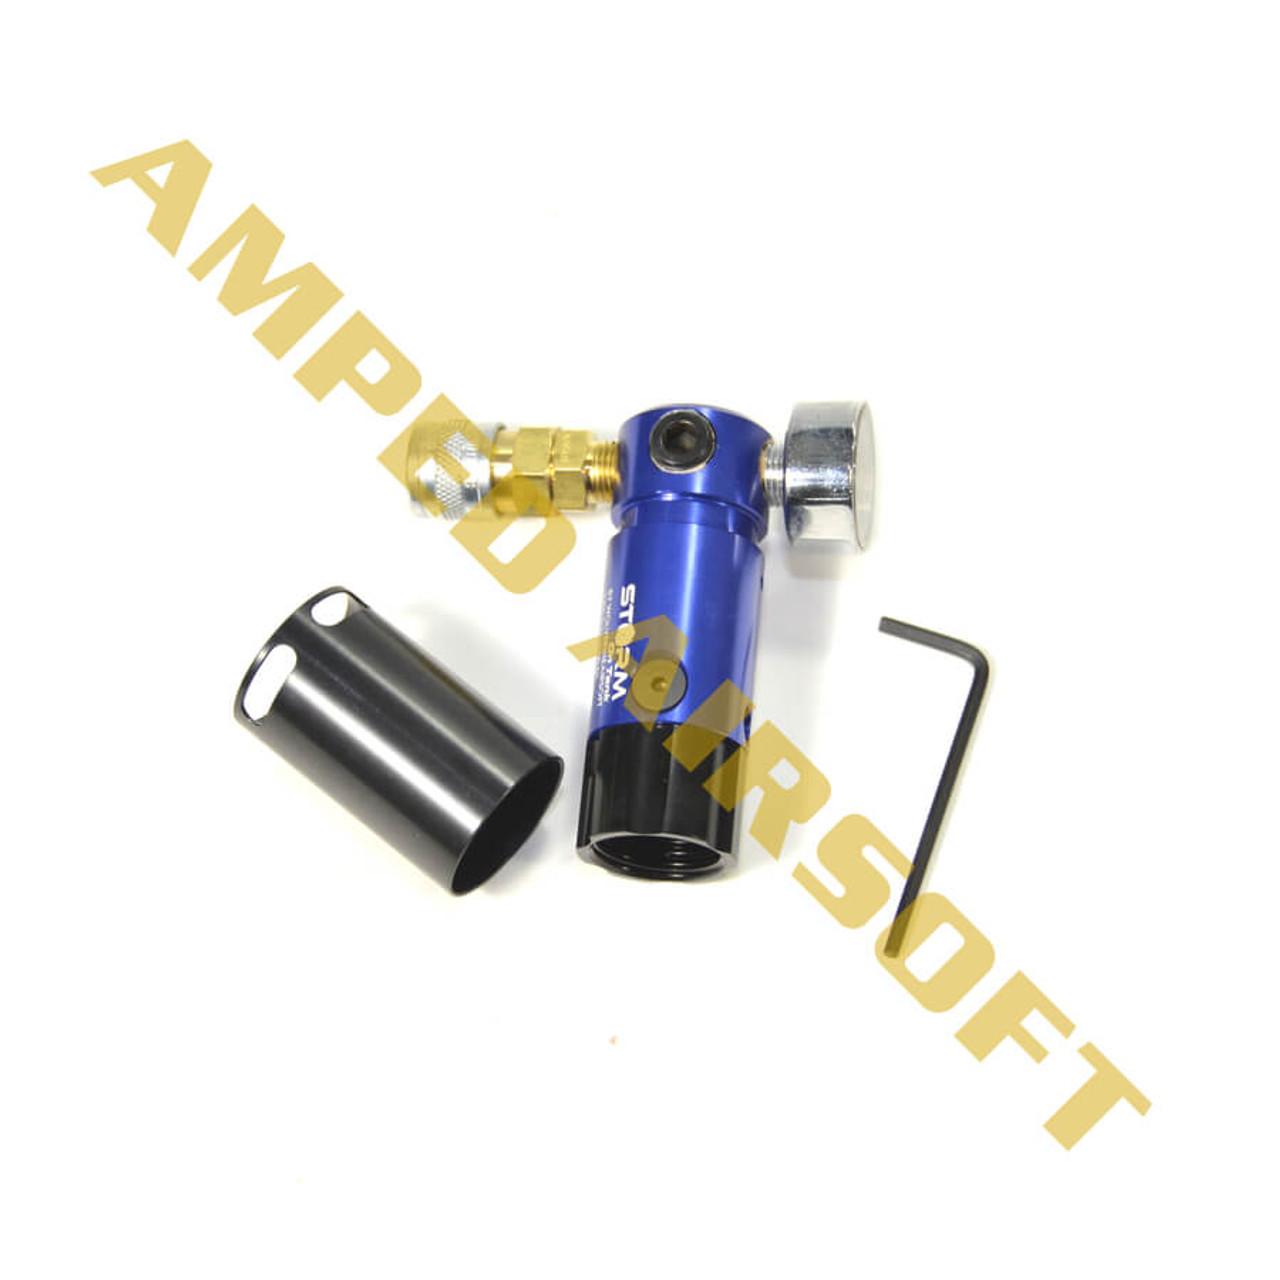 Wolverine Airsoft STORM ONTANK Regulator (Blue)